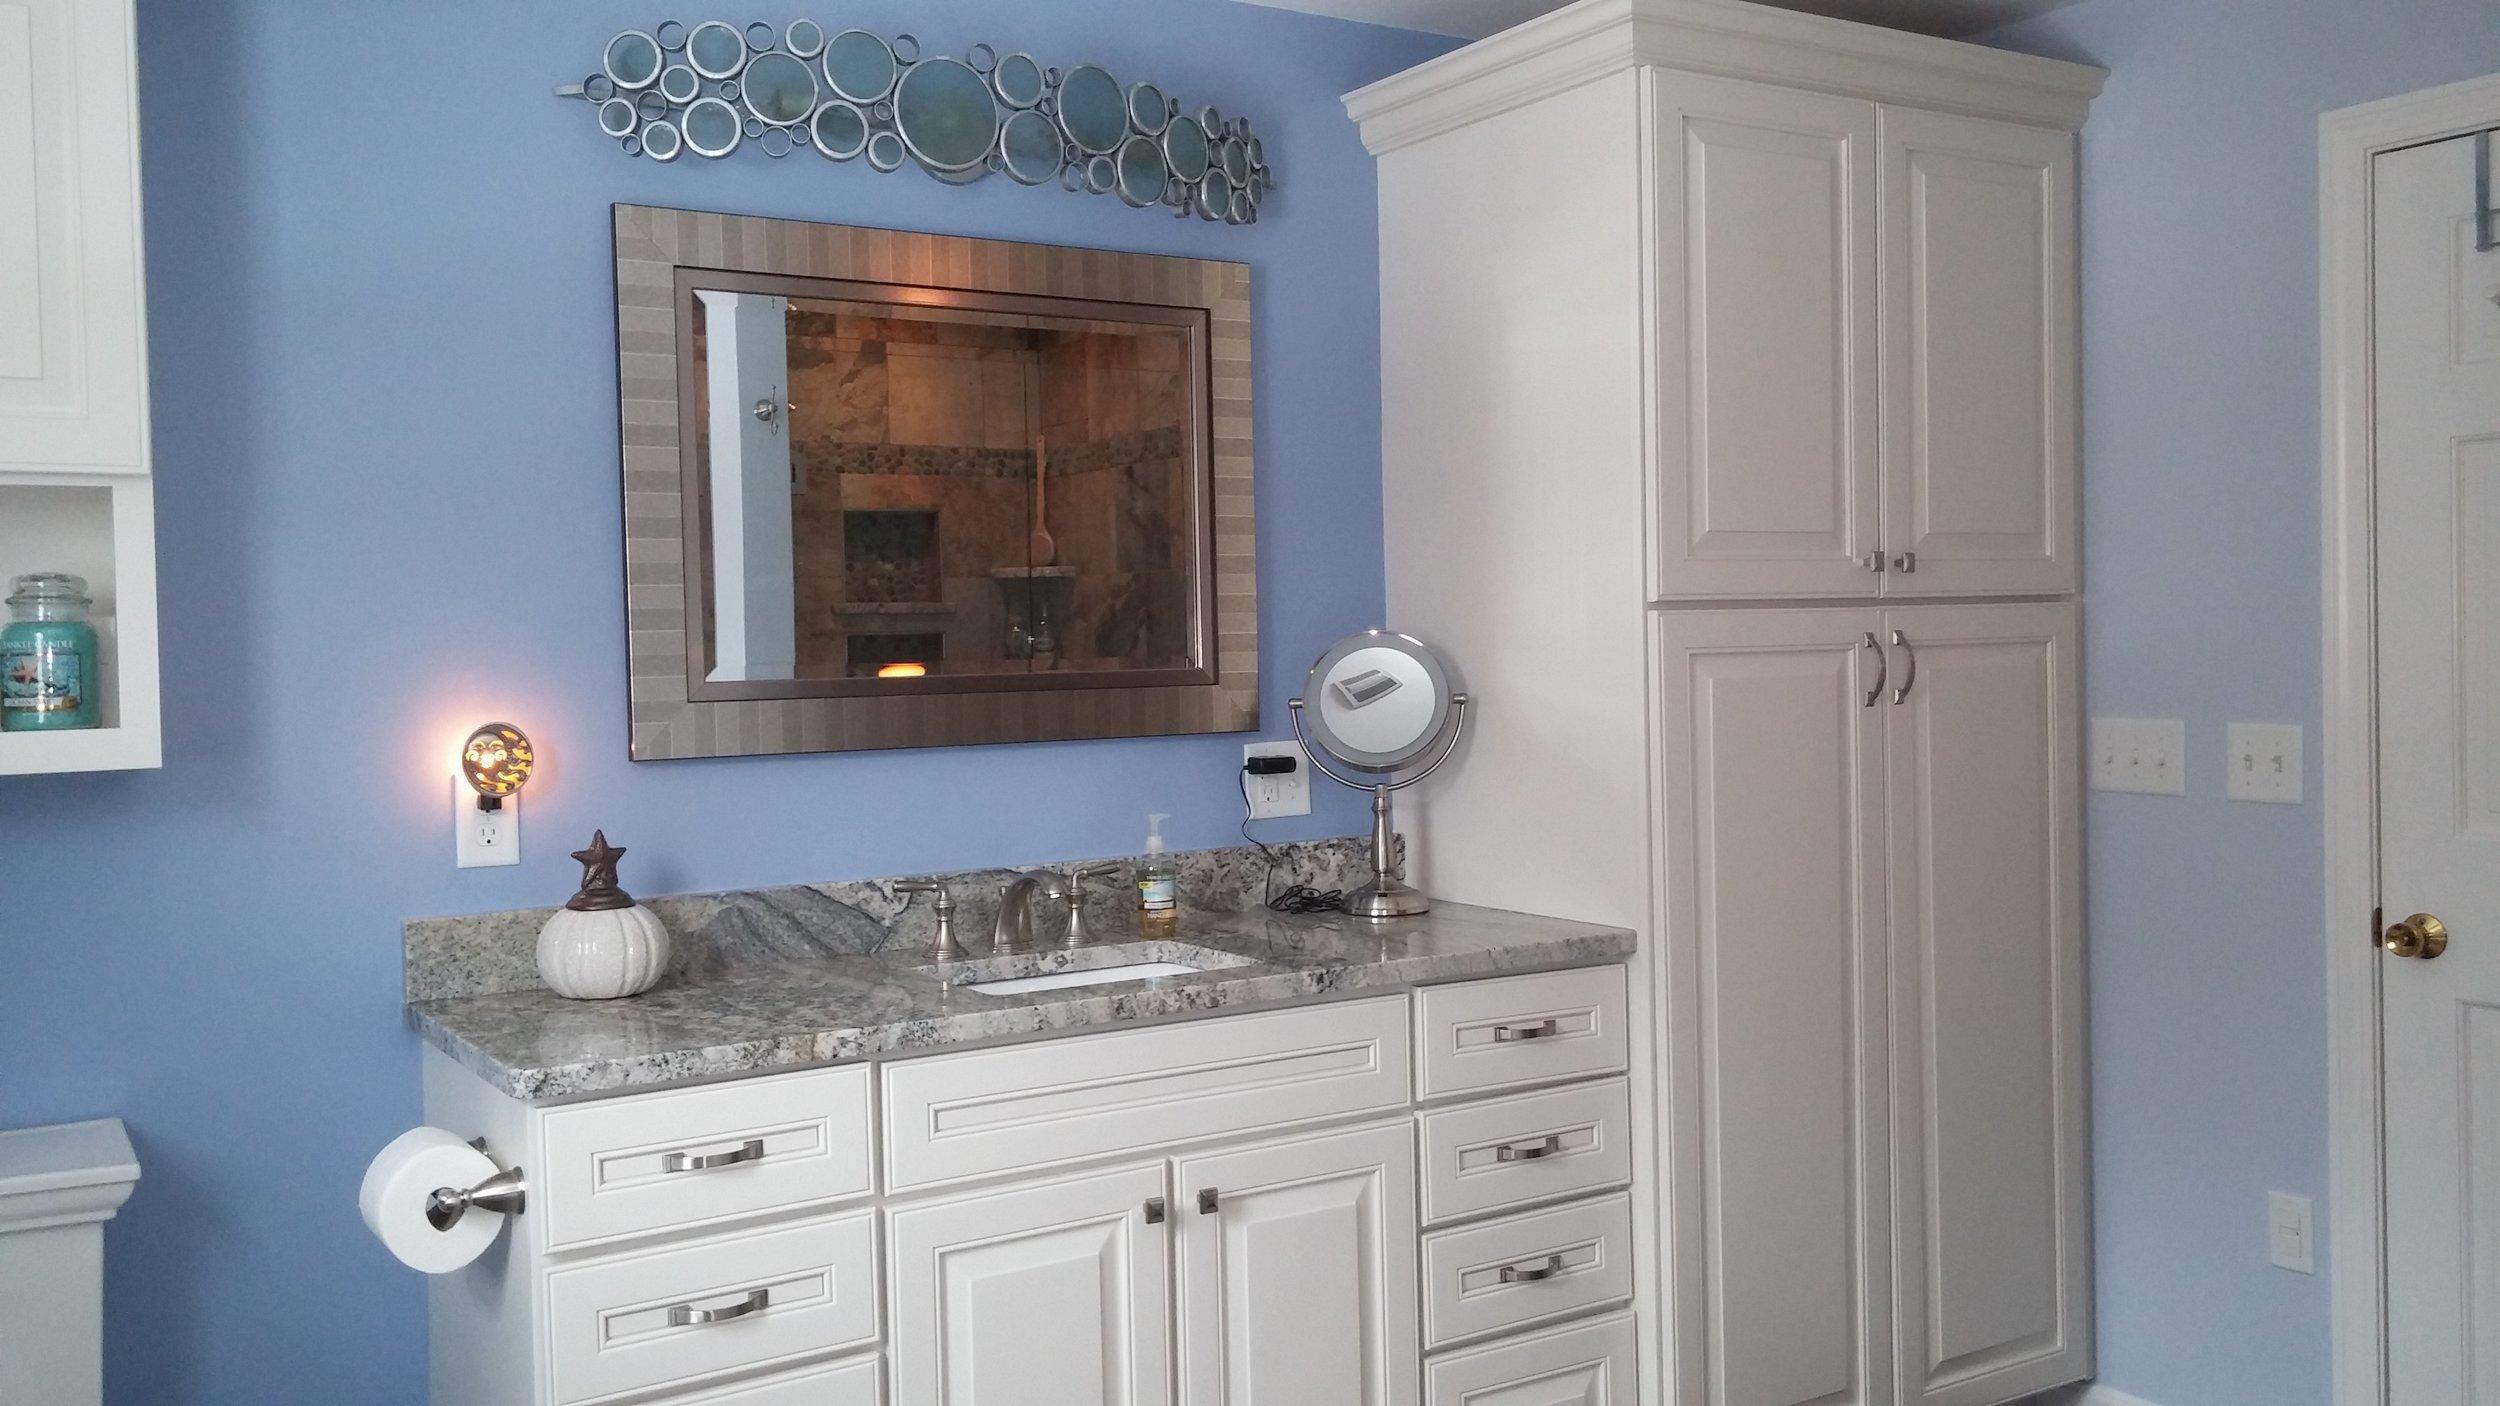 Upscale Bathroom Renovation/Remodel - West Brookfield, MA